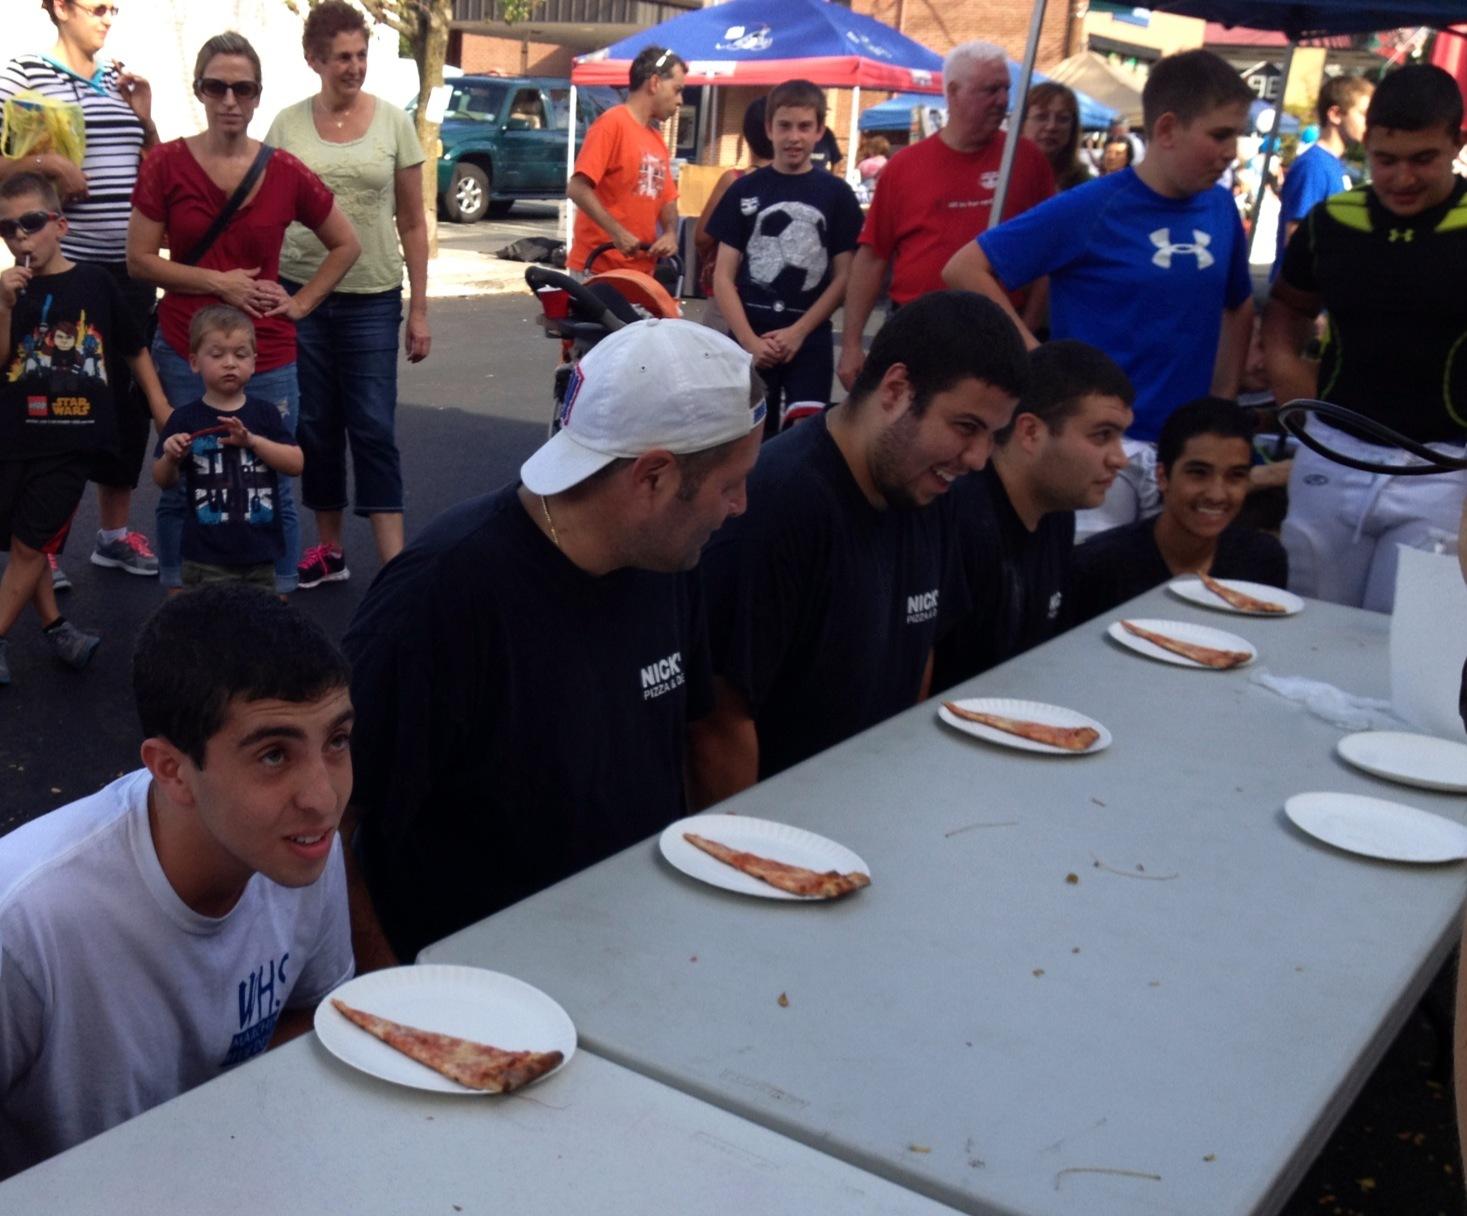 0929416964dda79d8869_Pizza_Eating_contest.jpg